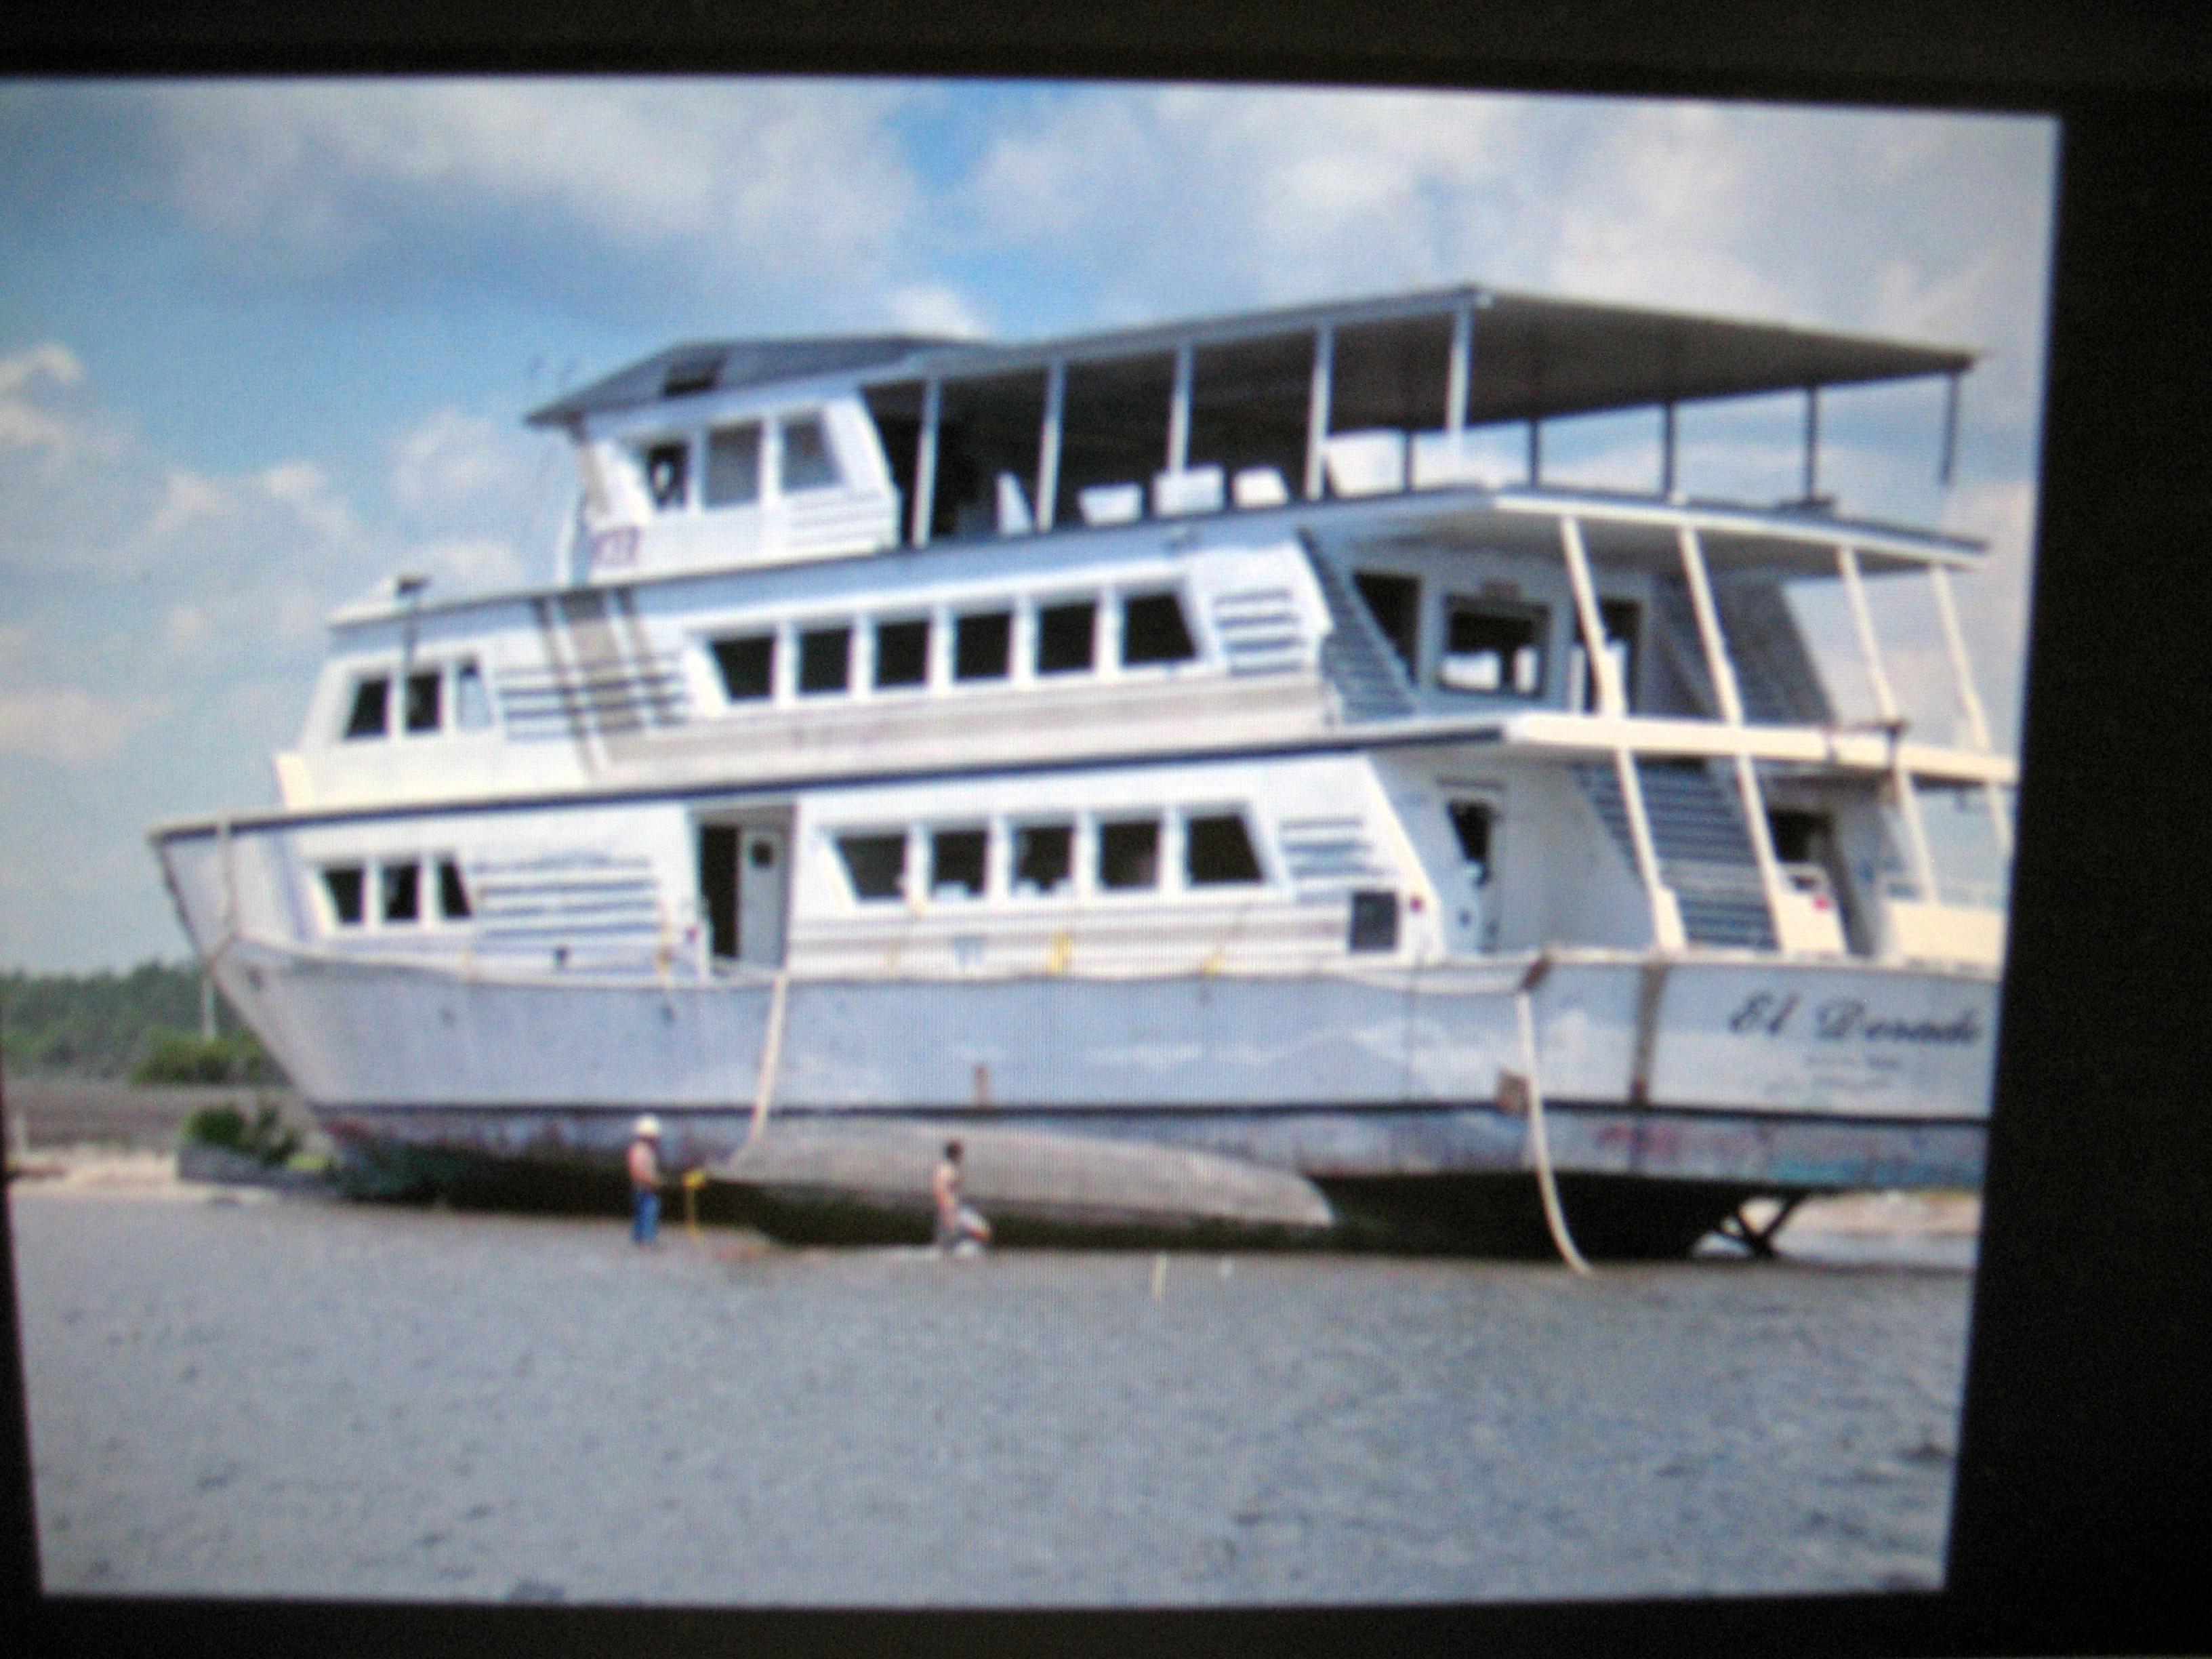 Panama city florida gambling boats russian roulette death on camera